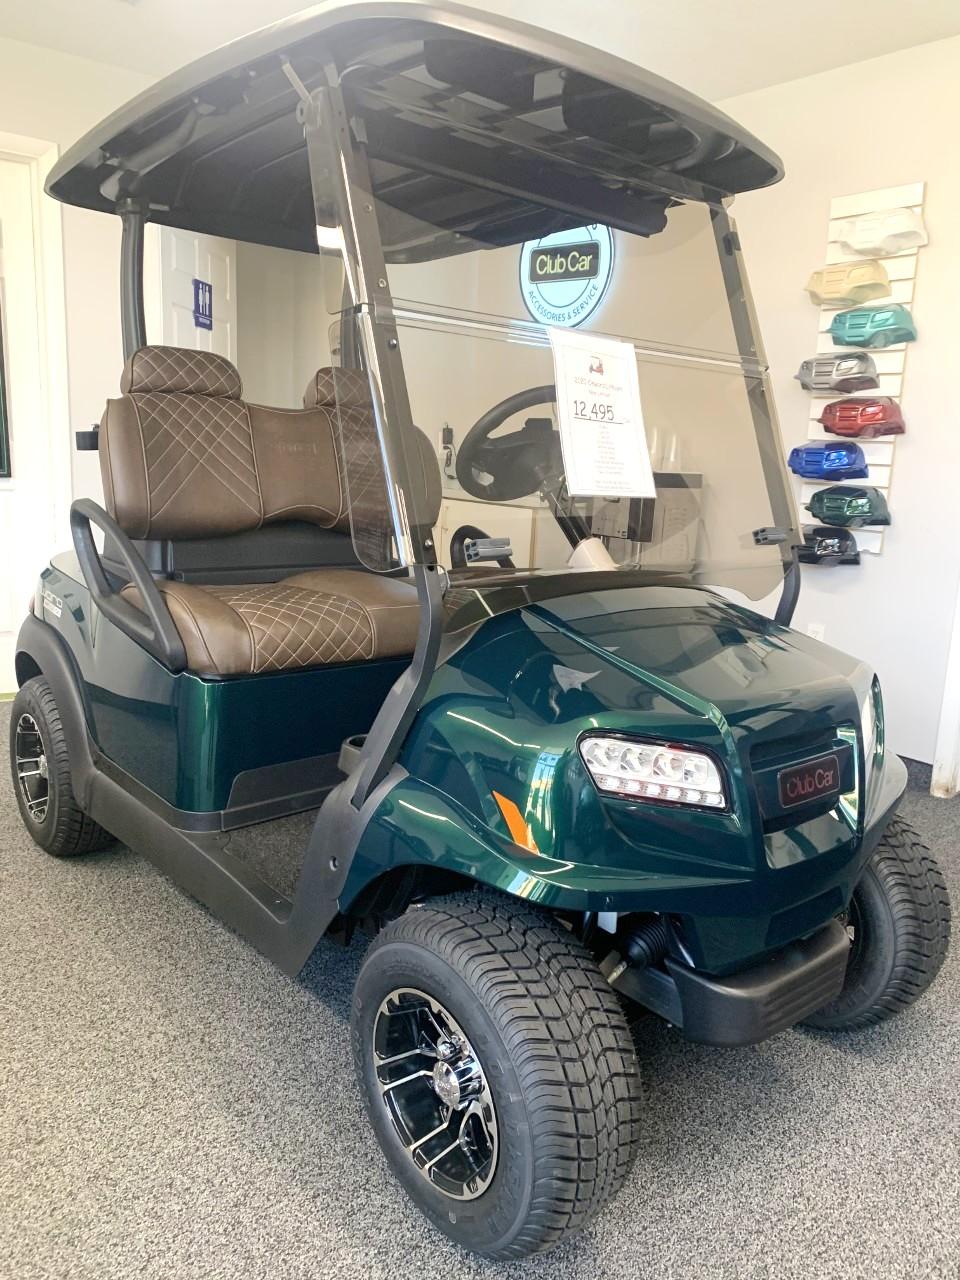 New 2020 Club Car Jade Green ONWARD w/ Lithium Batteries